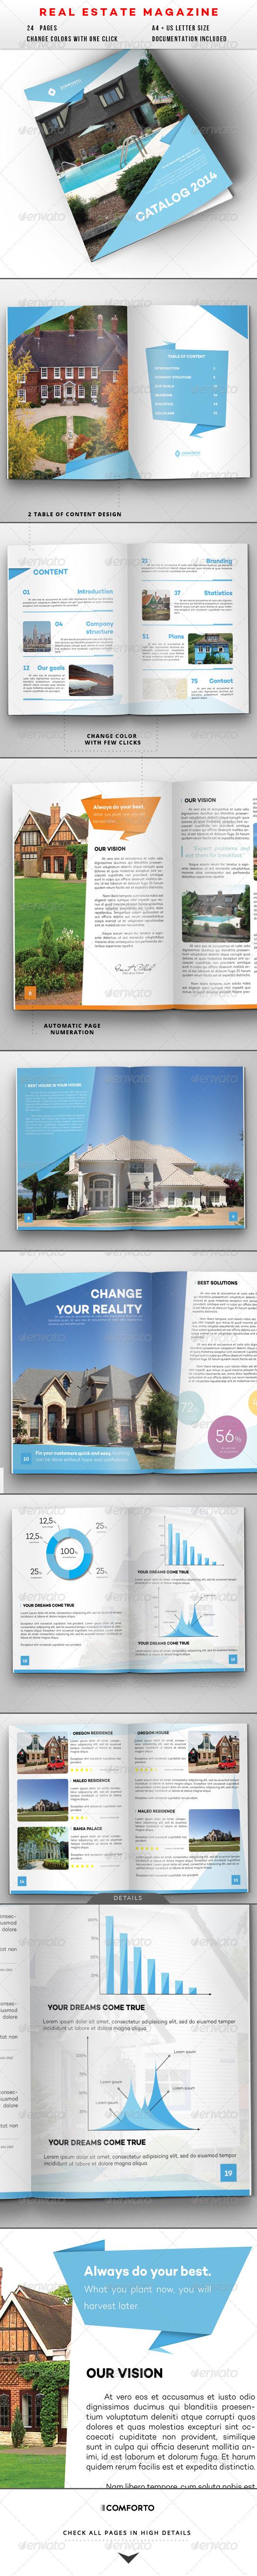 GraphicRiver Origami Real Estate And Travel Magazine 8285178